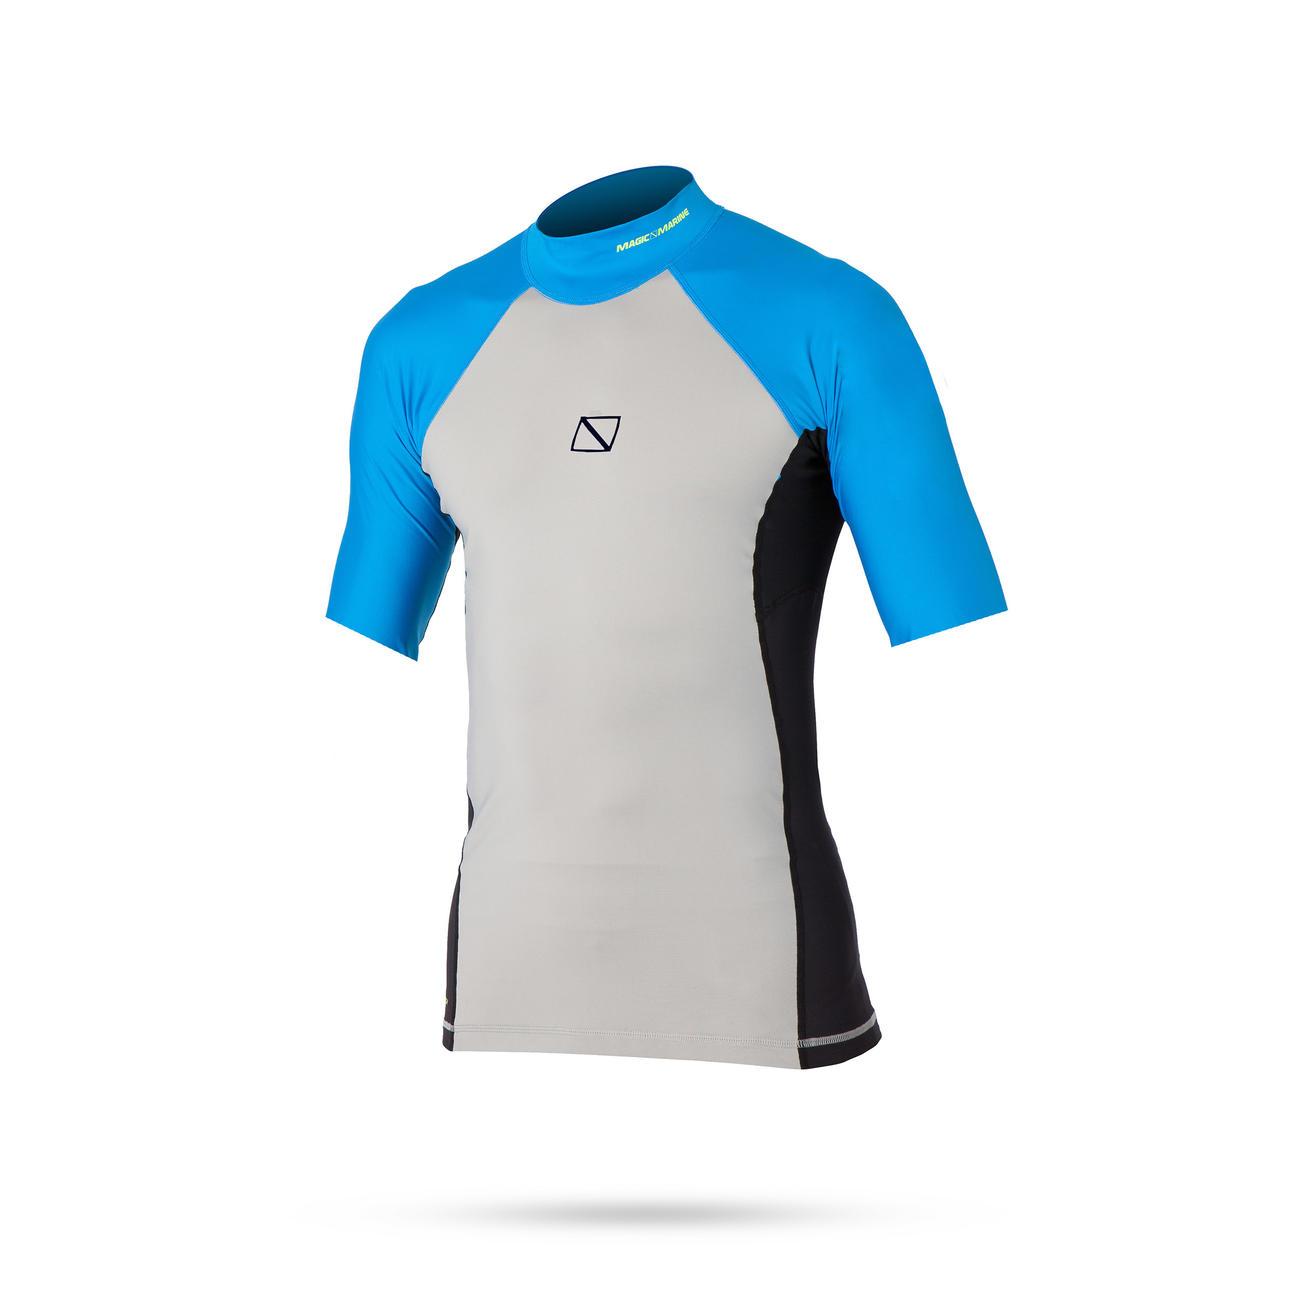 ENERGY RASH VEST S/S Rash vest | unisex ラッシュガード メンズ レディース 半袖 UVカット